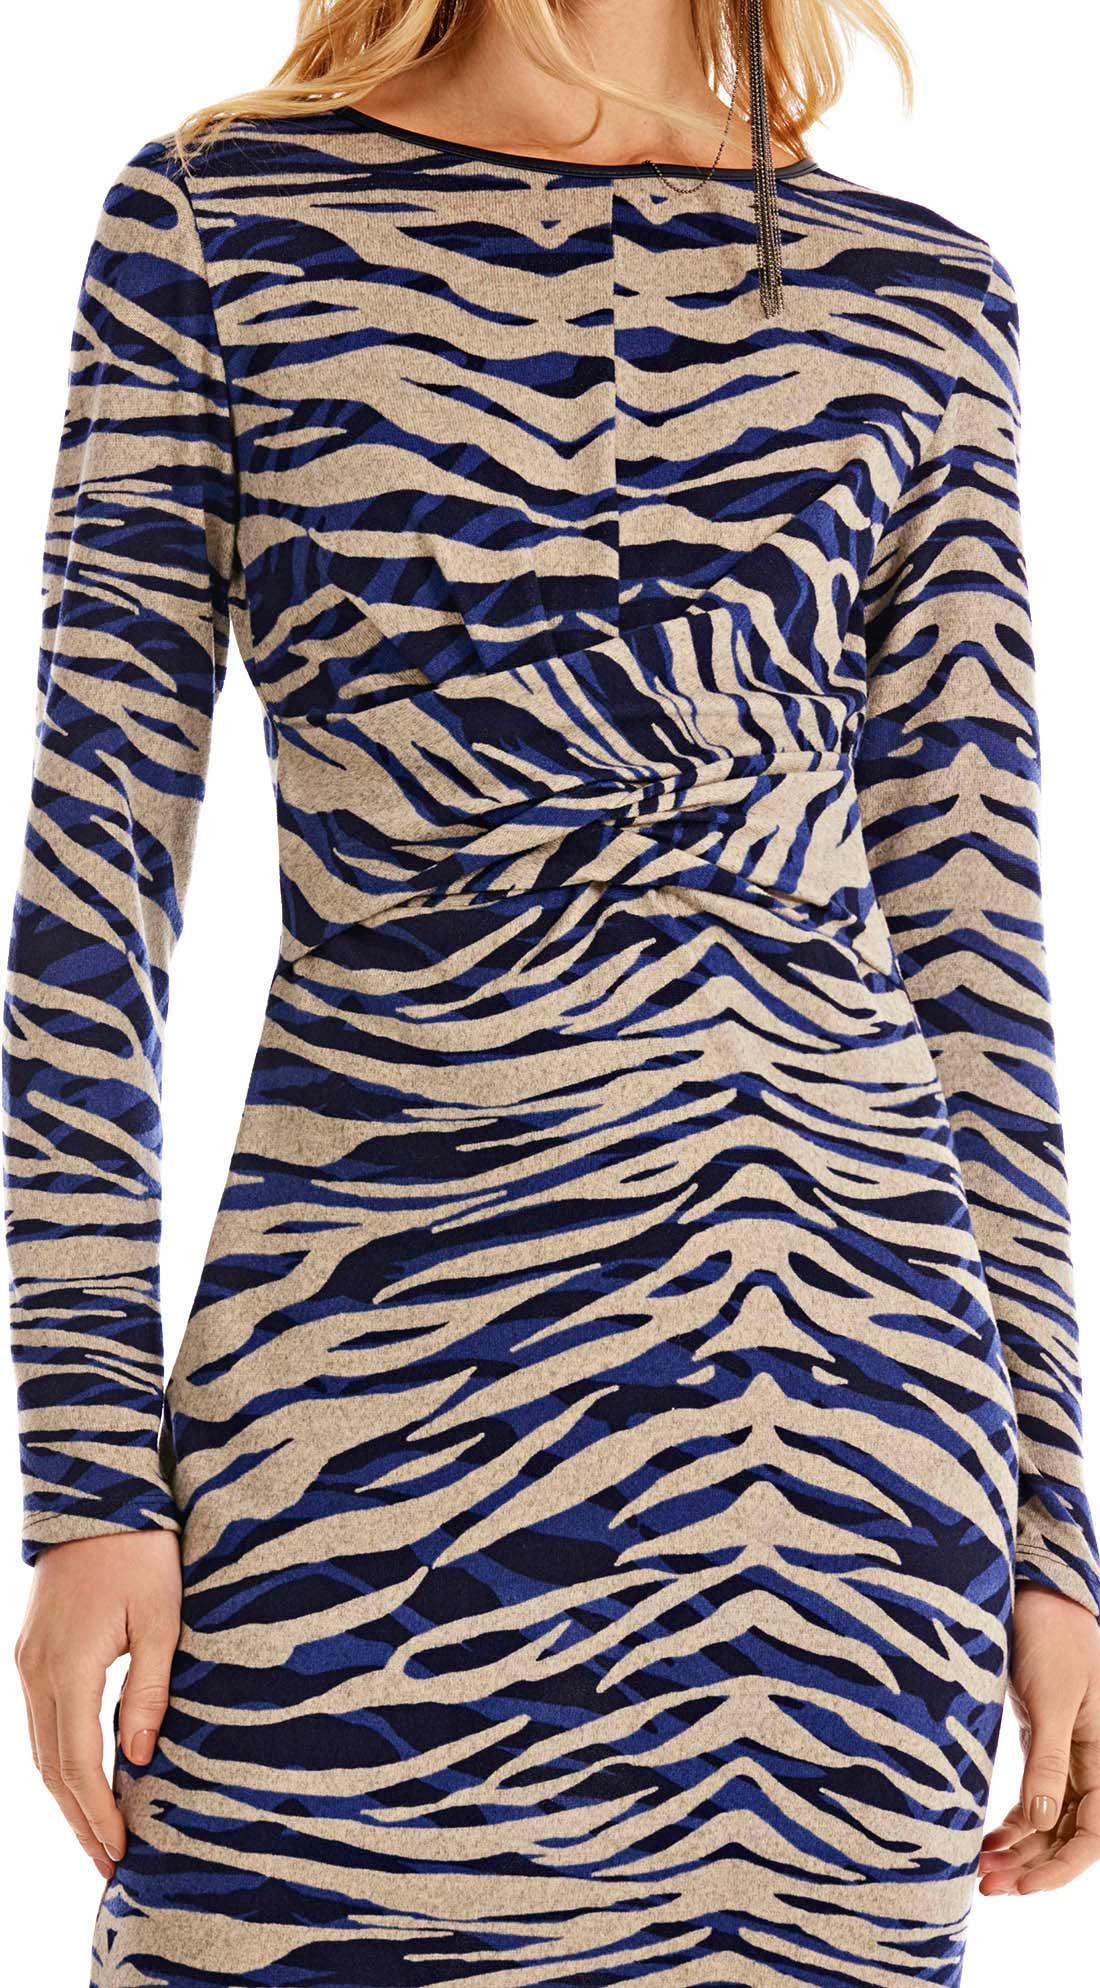 1edee601af Vestido Curto Decote Redondo Torcao Frente Azul - morenarosa